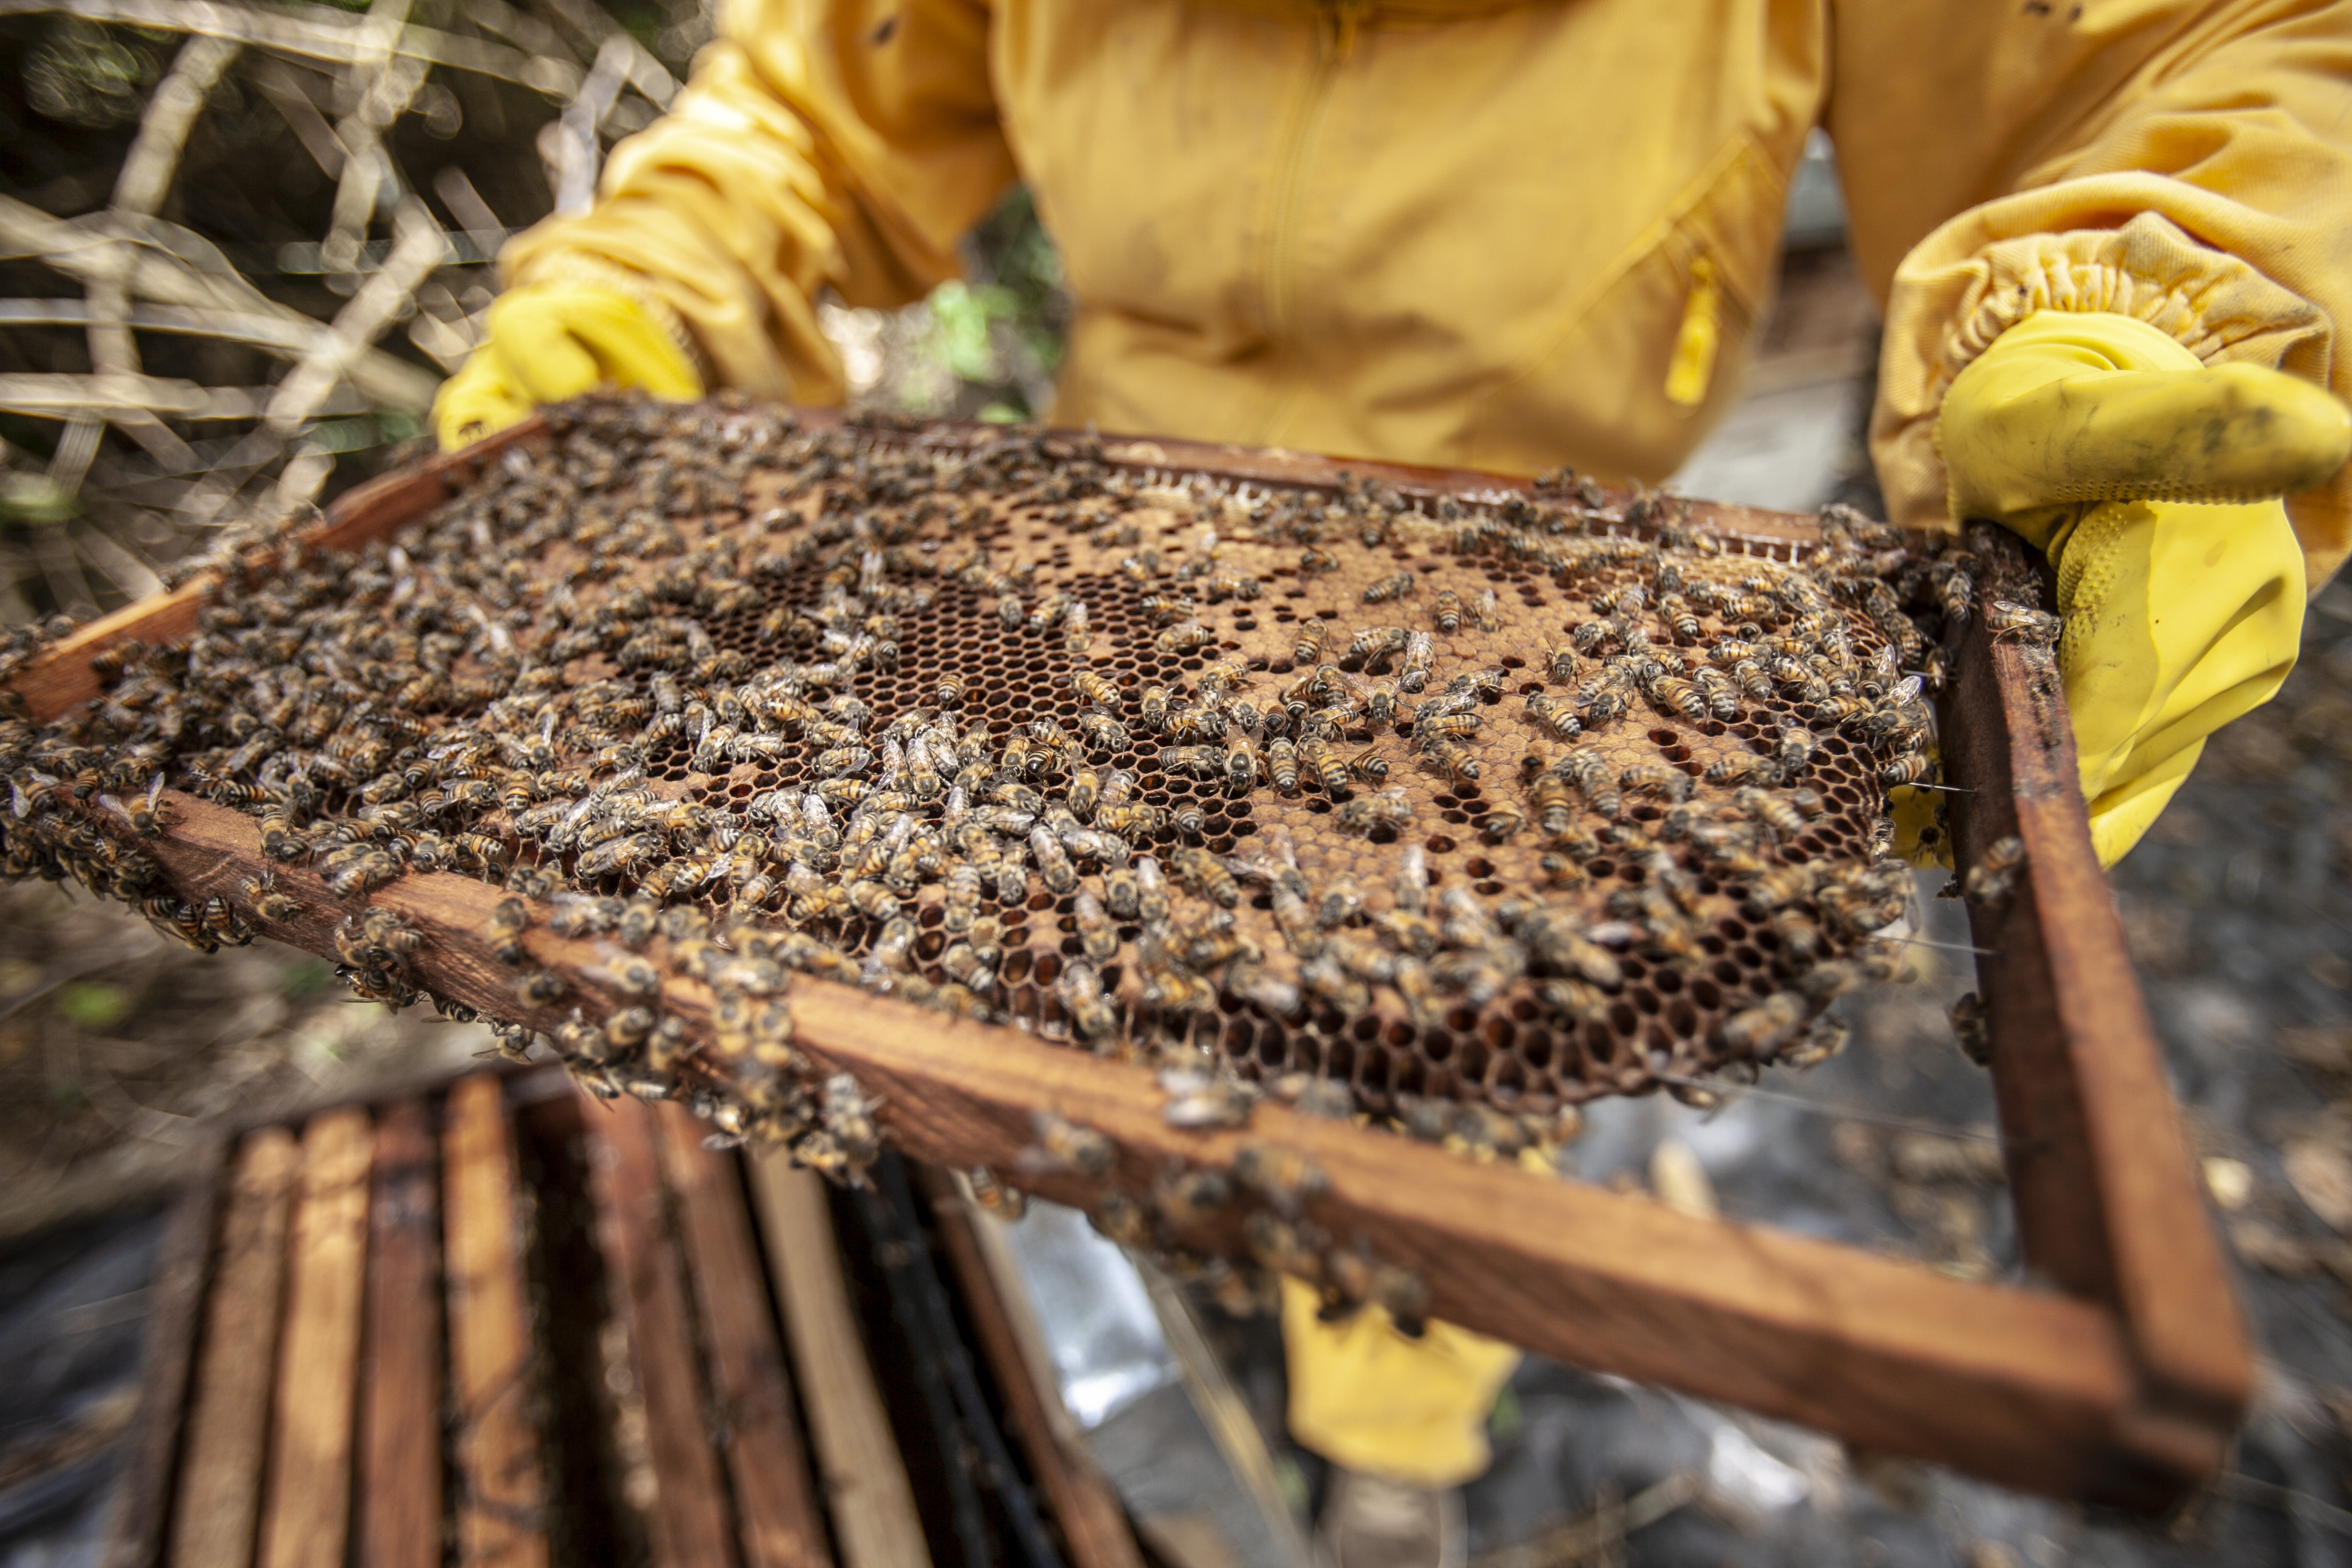 Close Up Photo of Bees